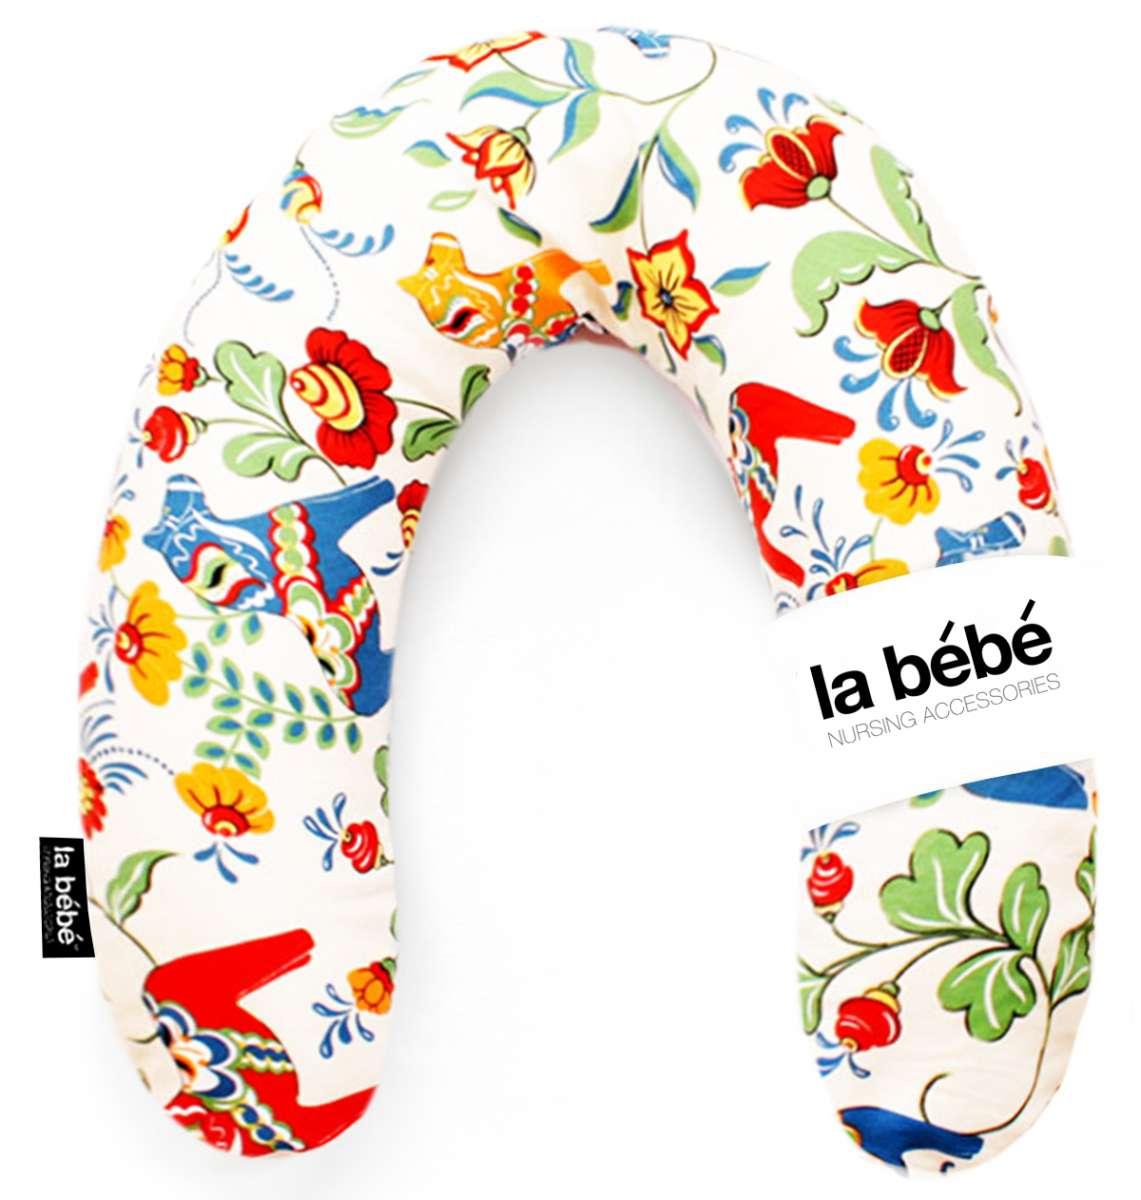 La Bebe Rich Cotton Nursing Maternity Pillow Swedish Color Dala Horse Pakaviņš pakavs mazuļa barošanai, gulēšanai